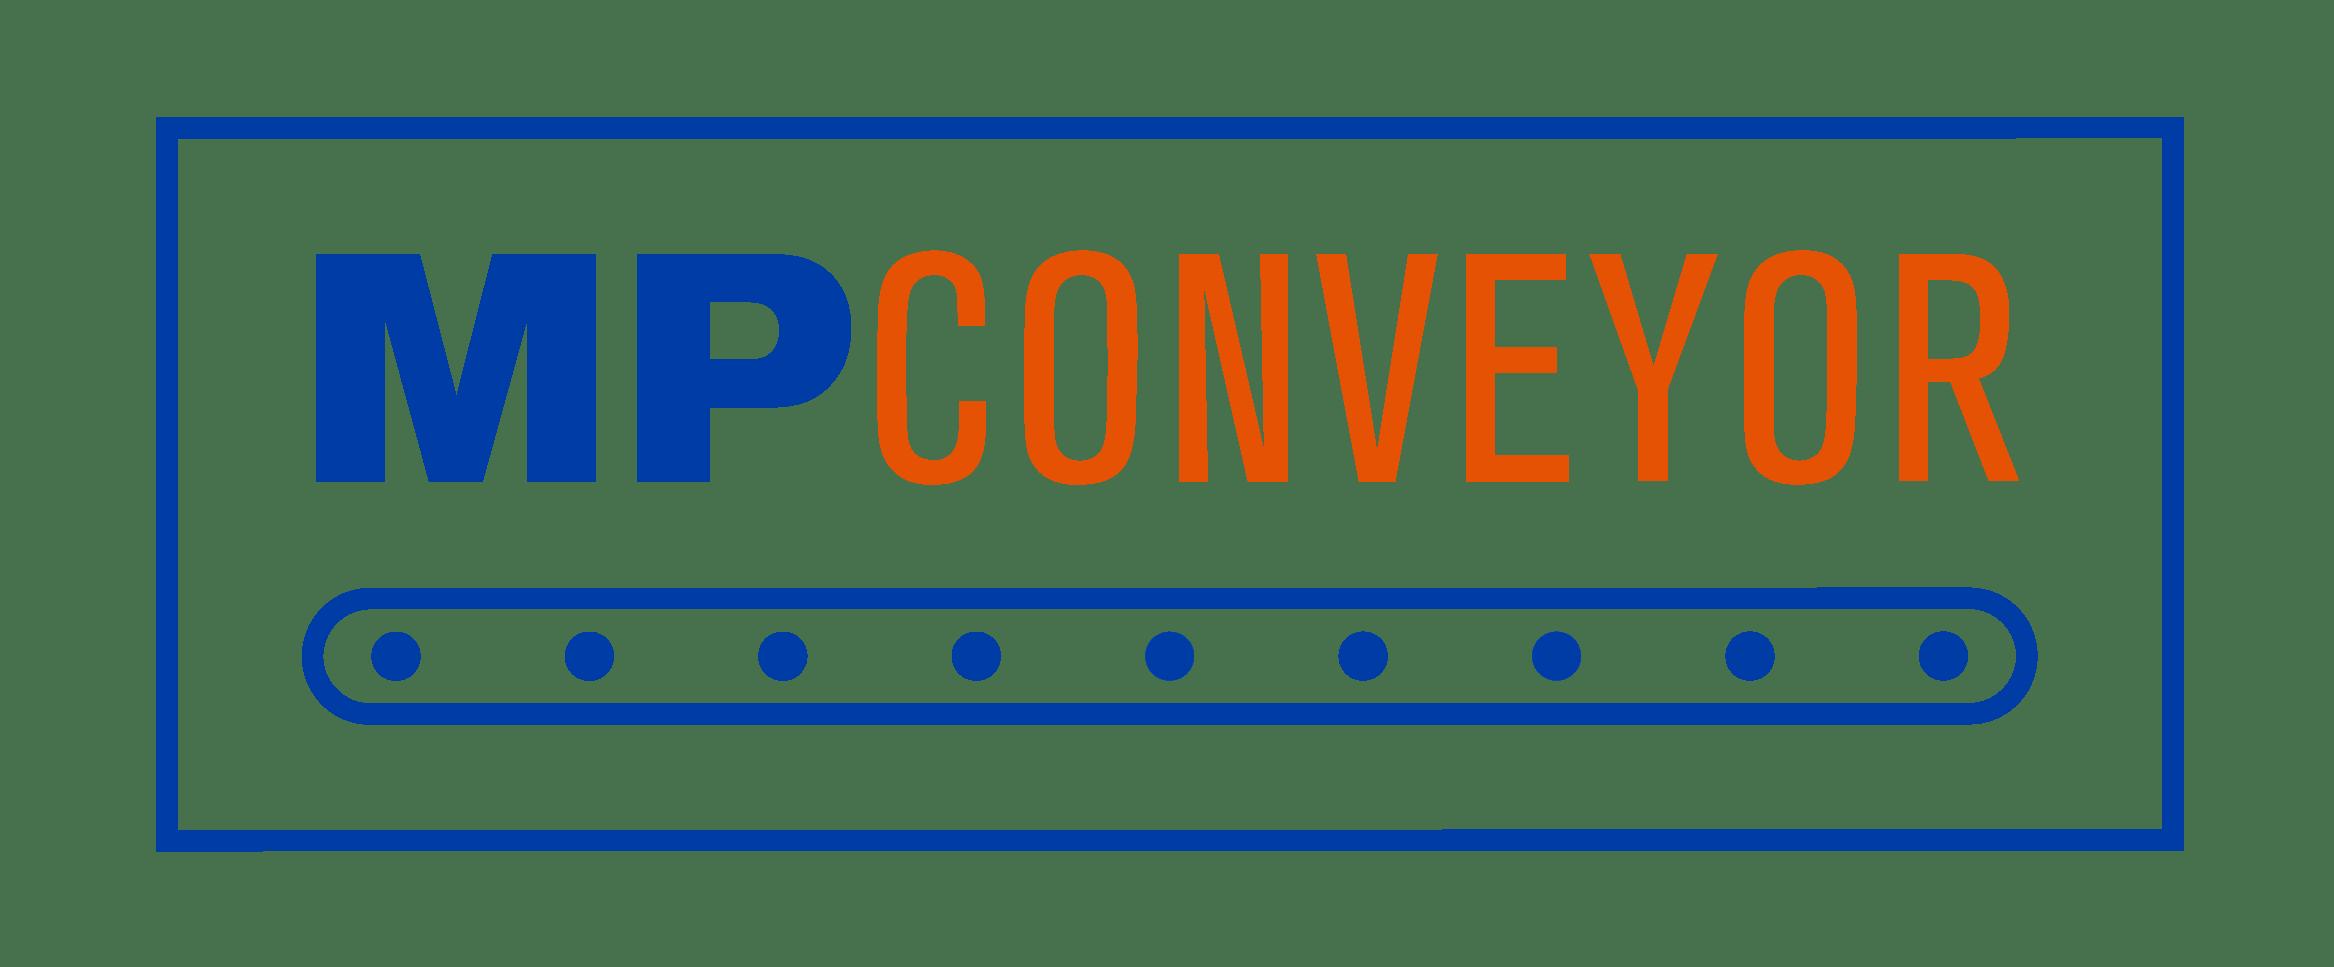 MPconveyor Simma